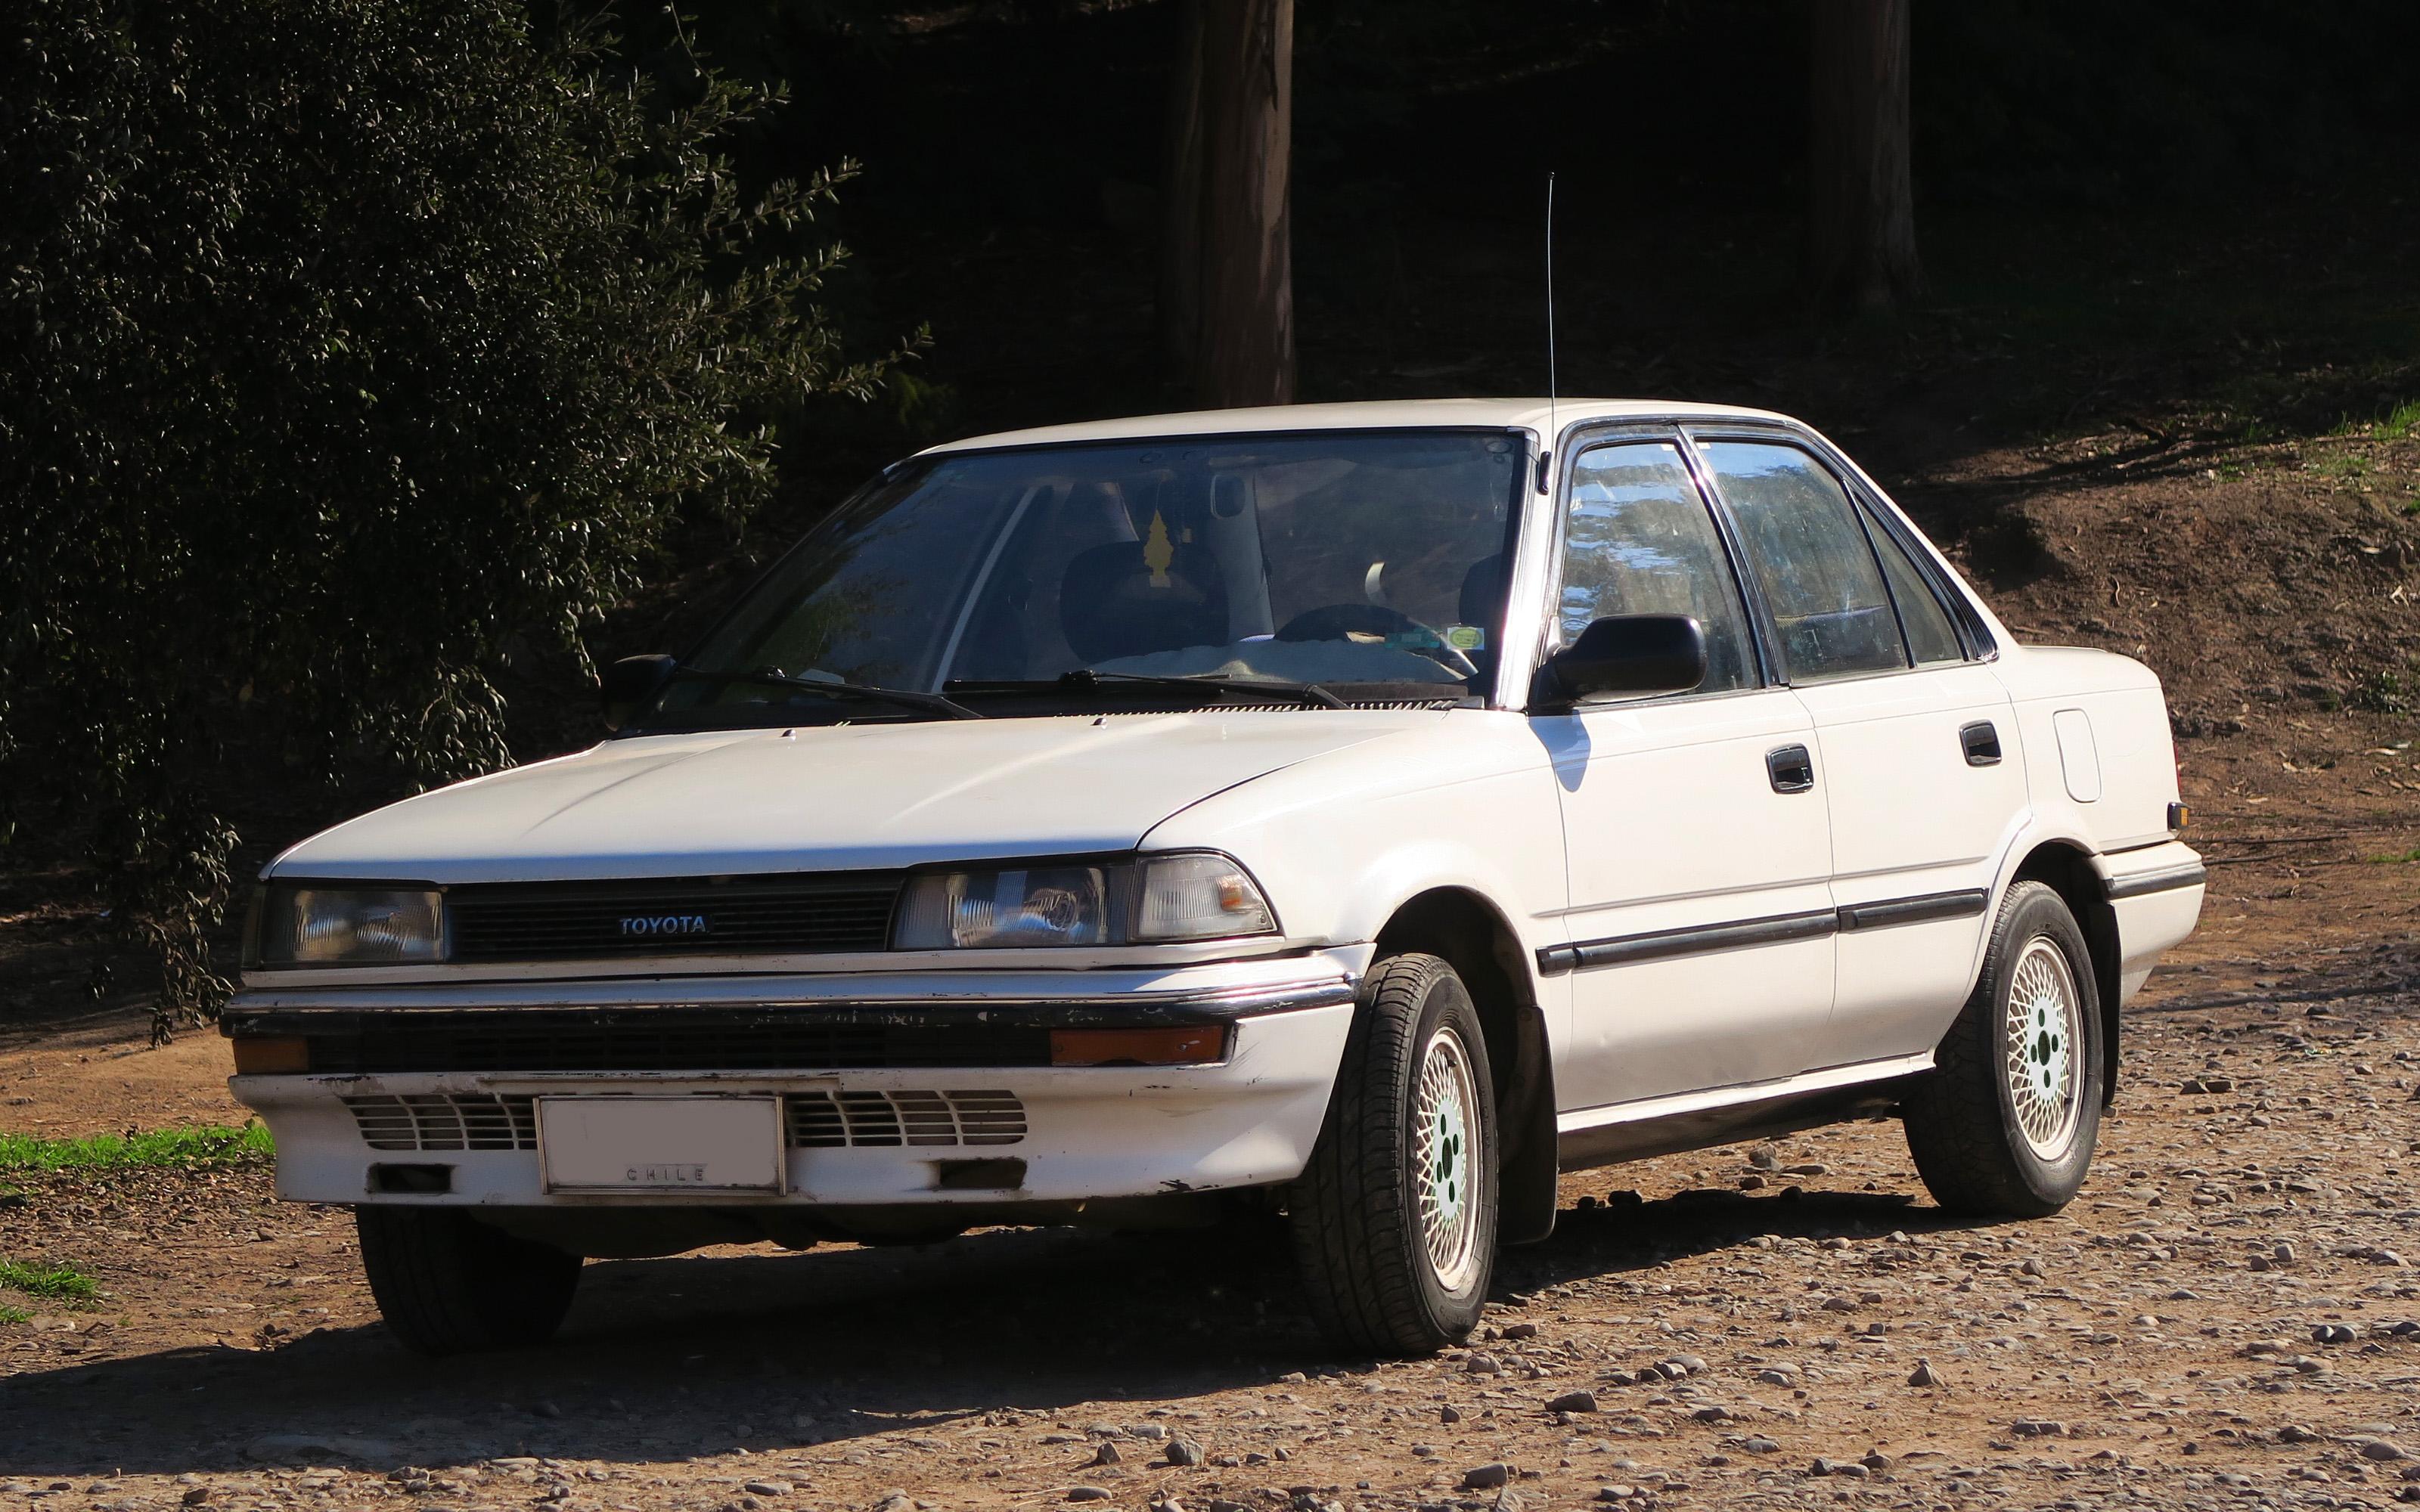 Kelebihan Toyota Xl Tangguh